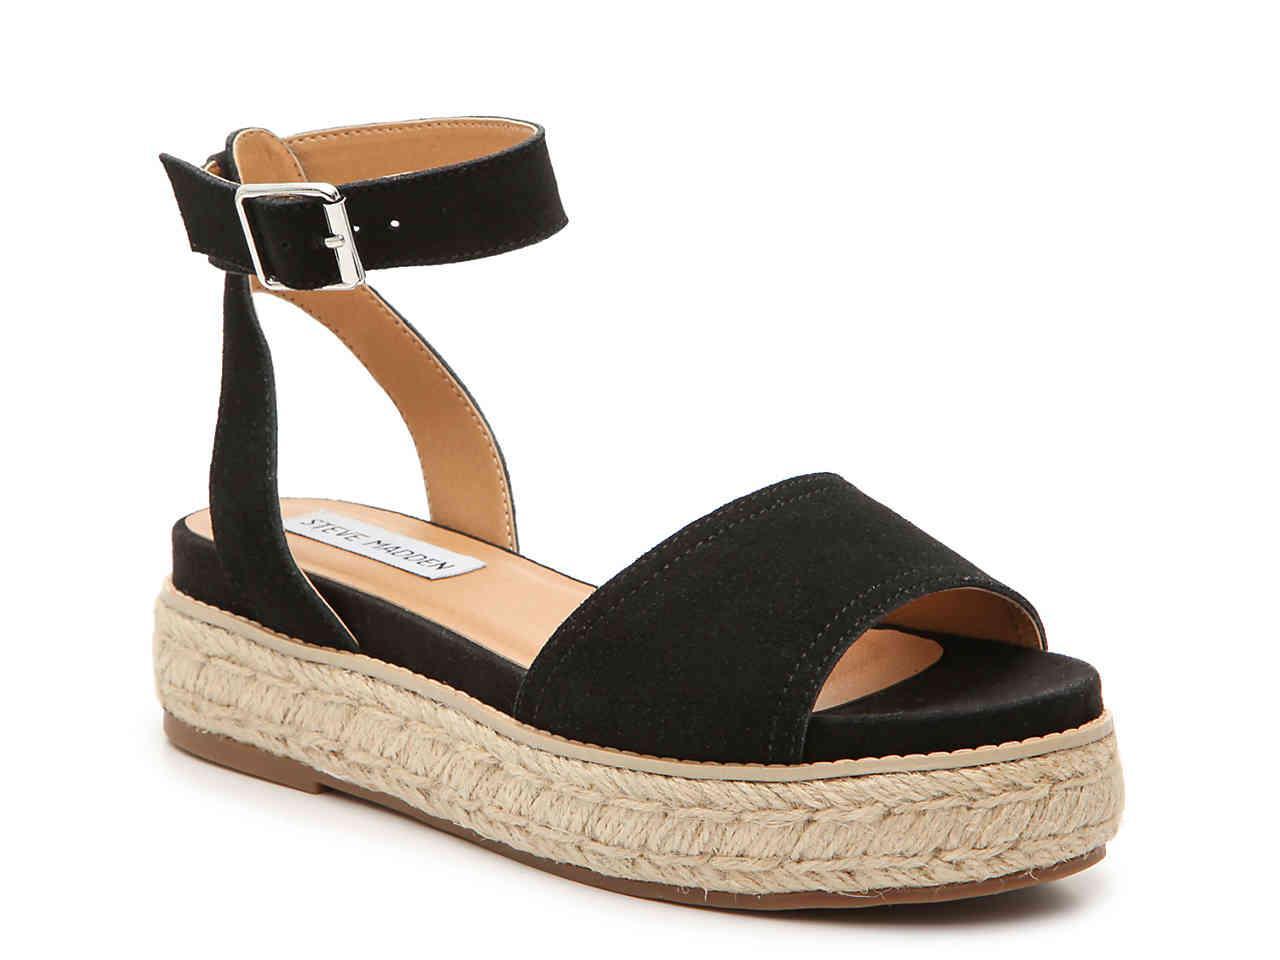 845b60d6085 Women's Black Gabi Espadrille Platform Sandal